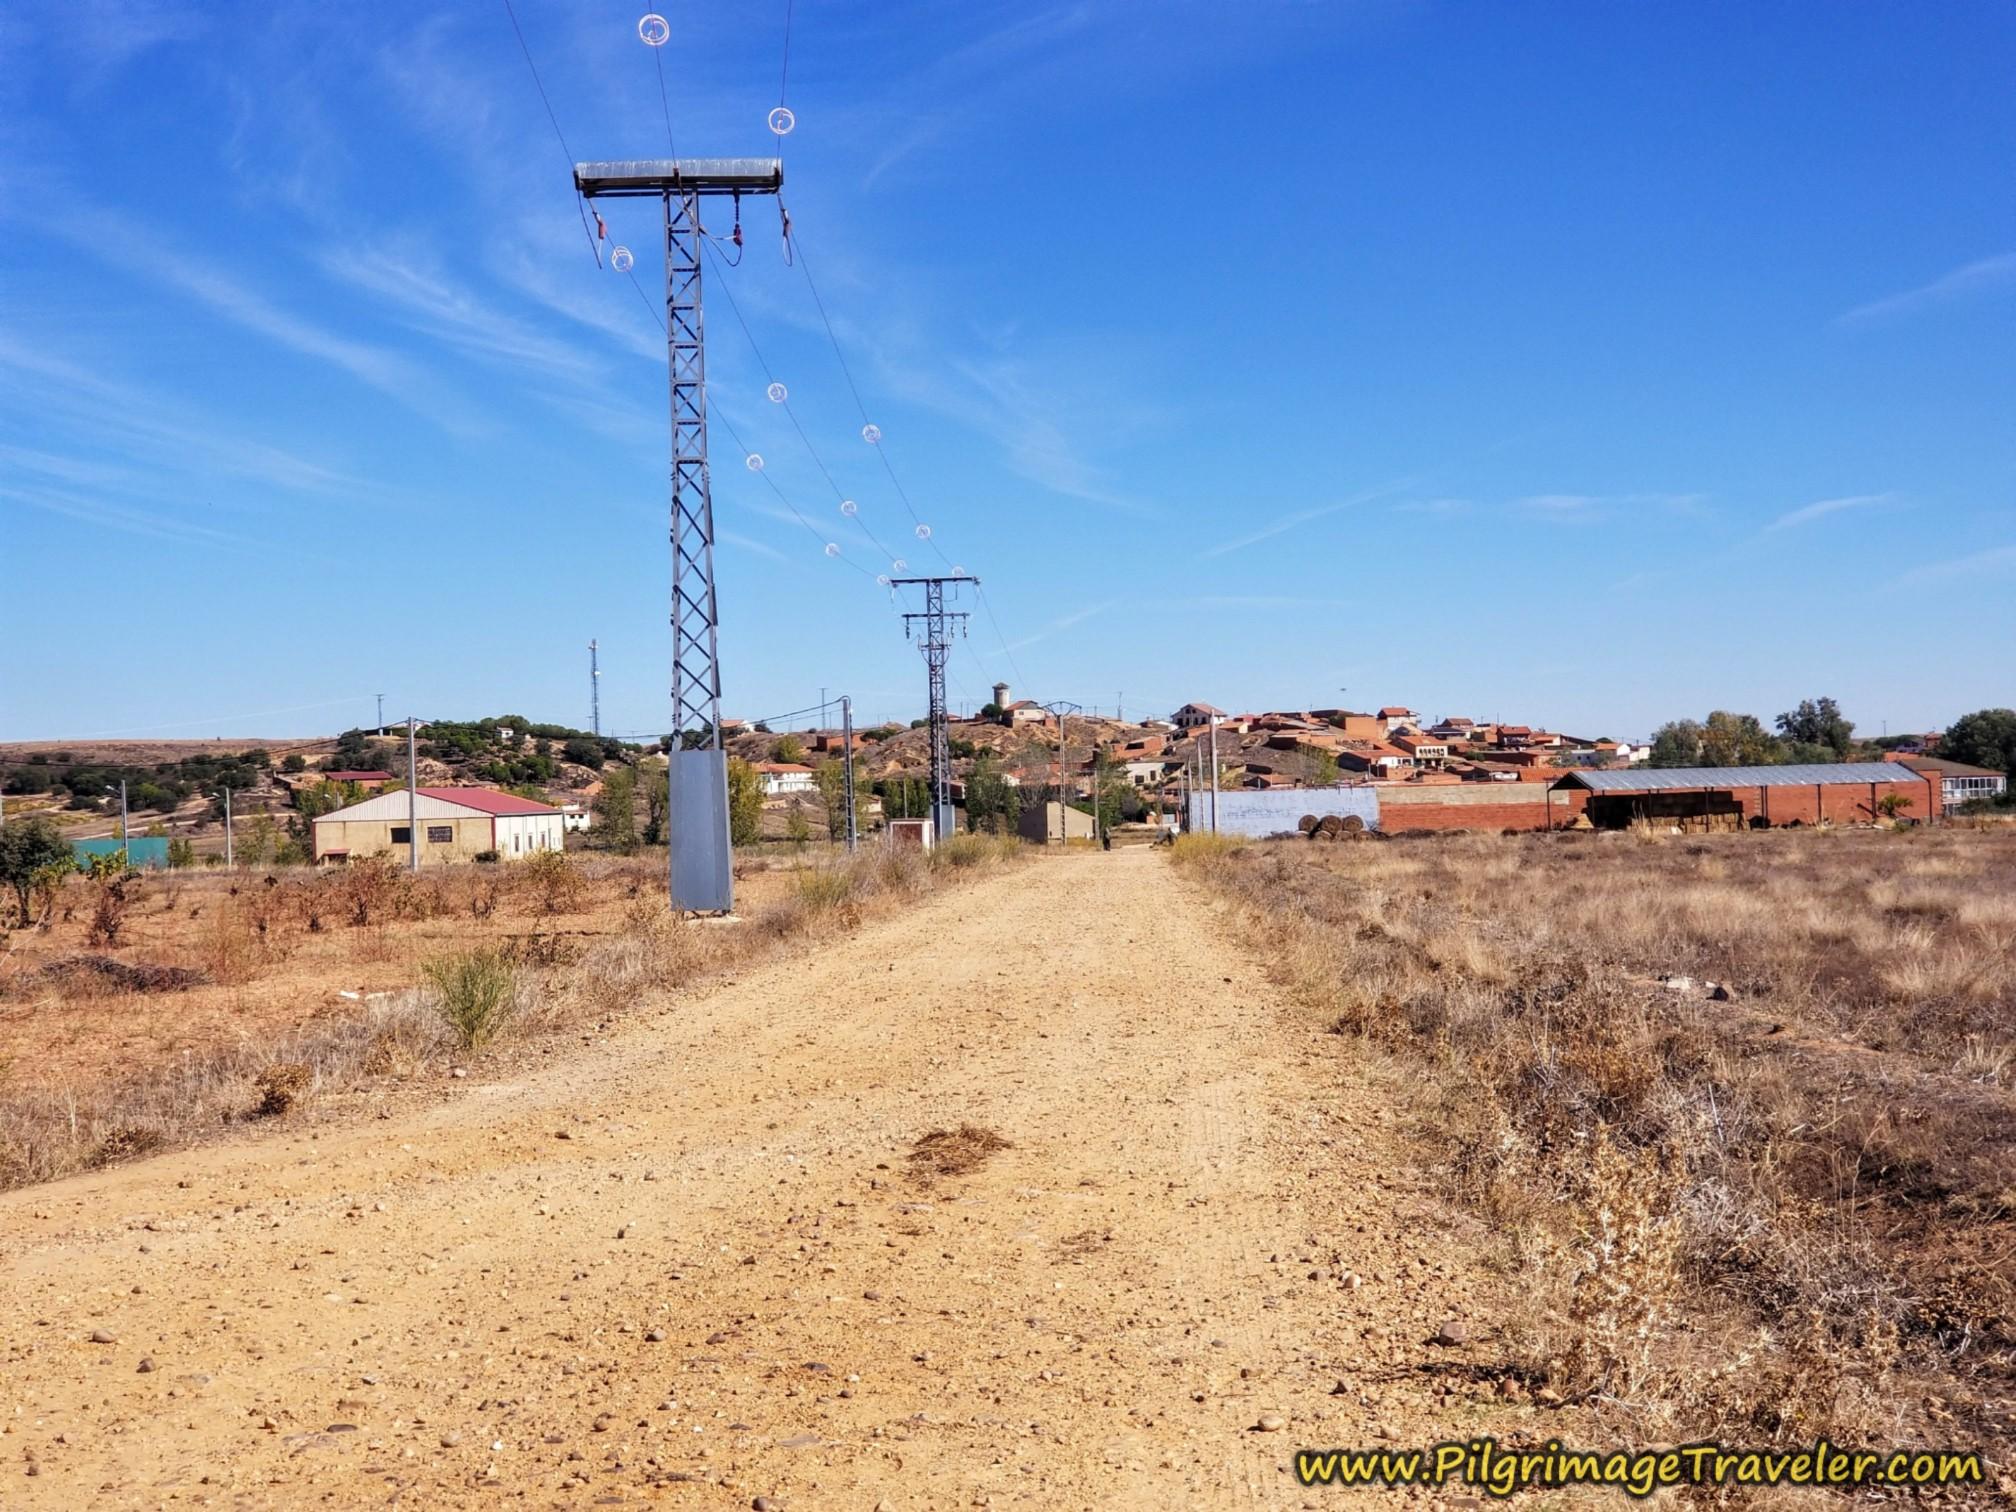 Entering Granja de Moreruela